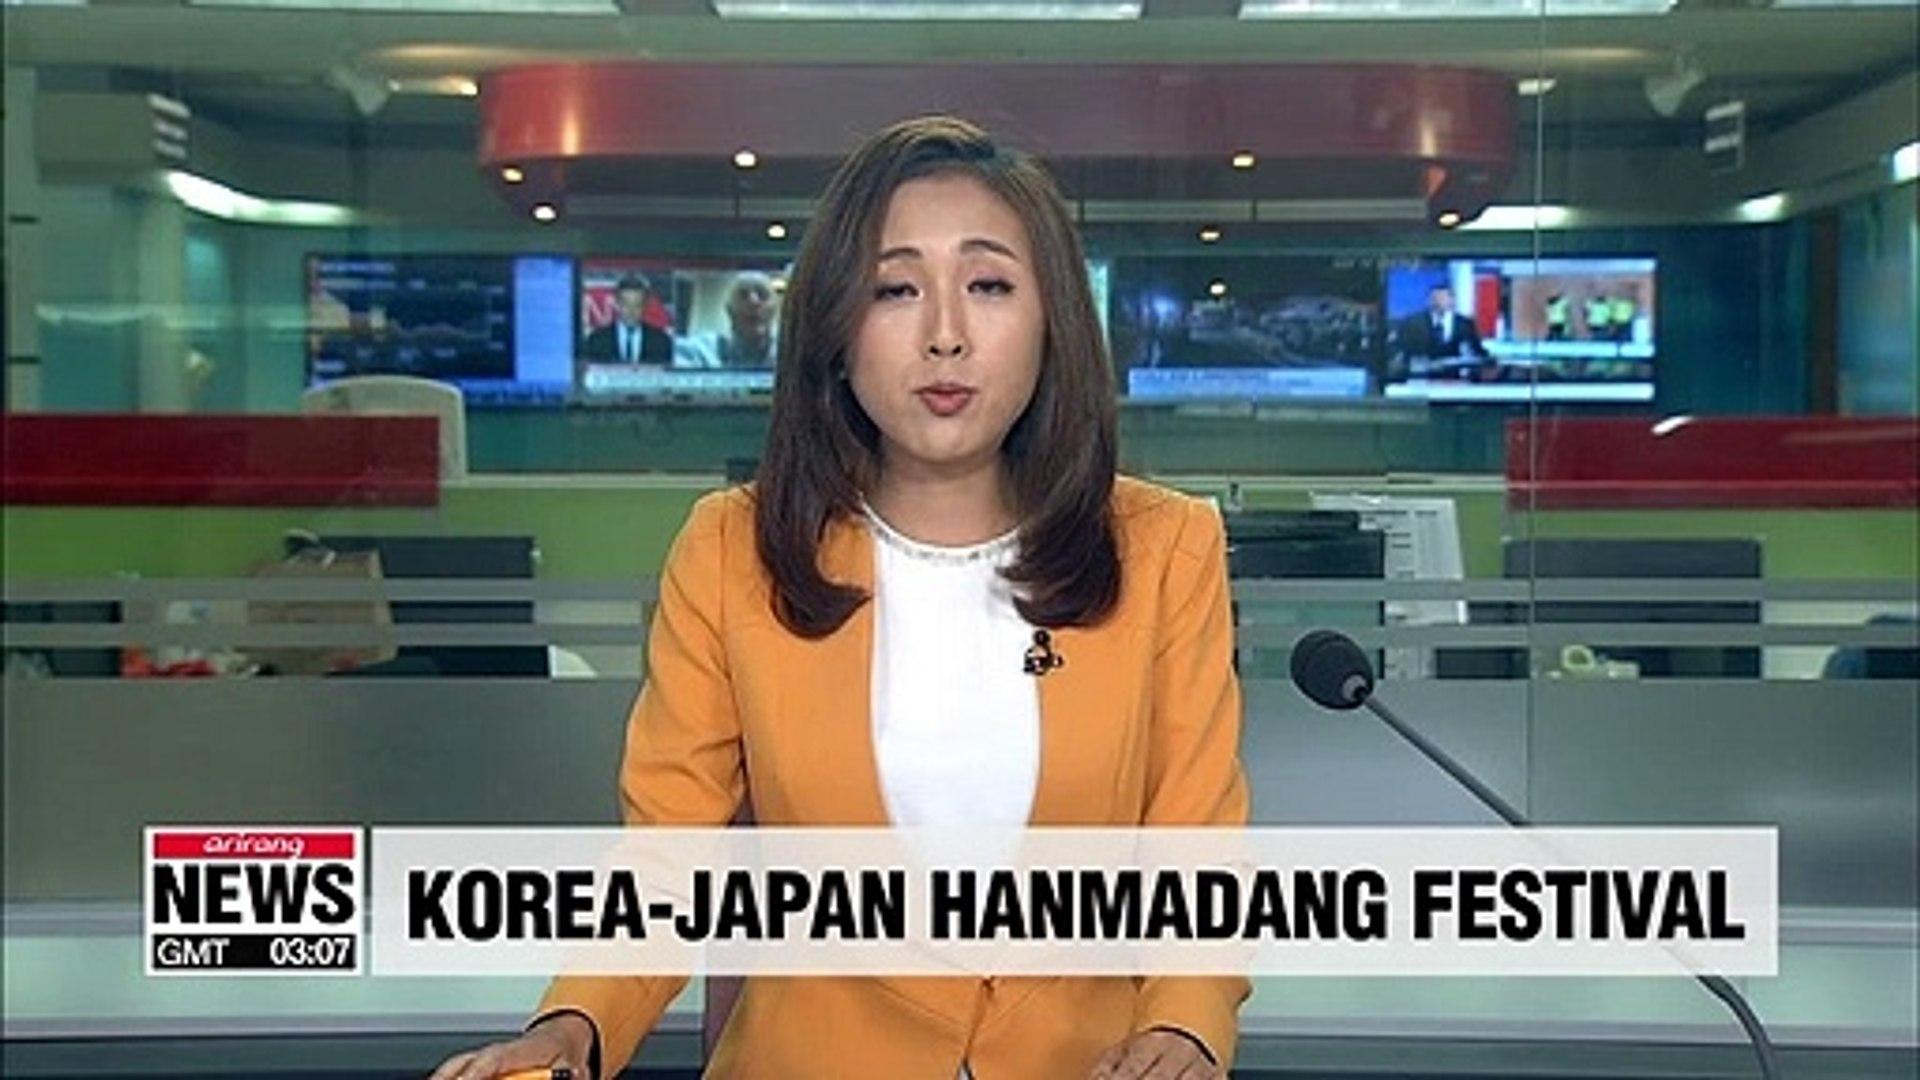 Korea-Japan Hanmadang Festival 2019 kicks off in Seoul amid frayed ties